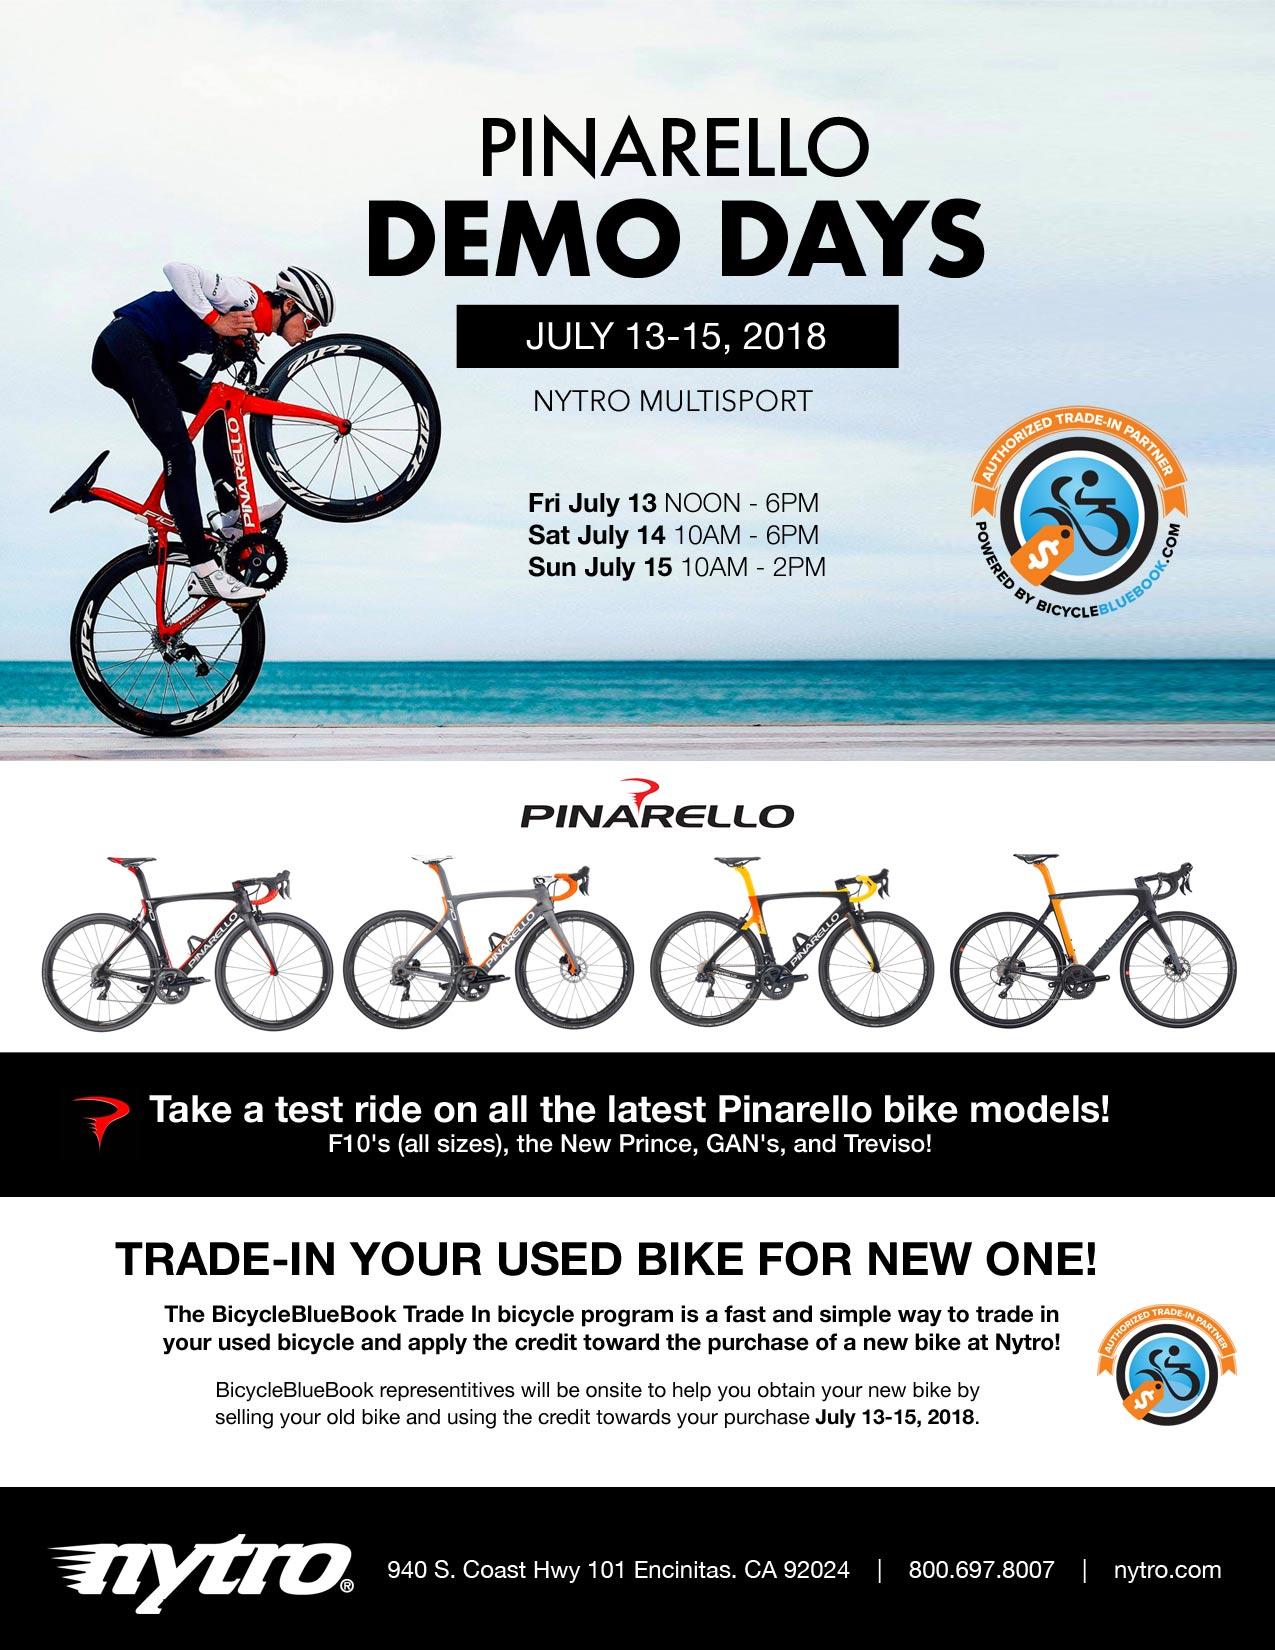 Pinarello Bike Demo Days at Nytro